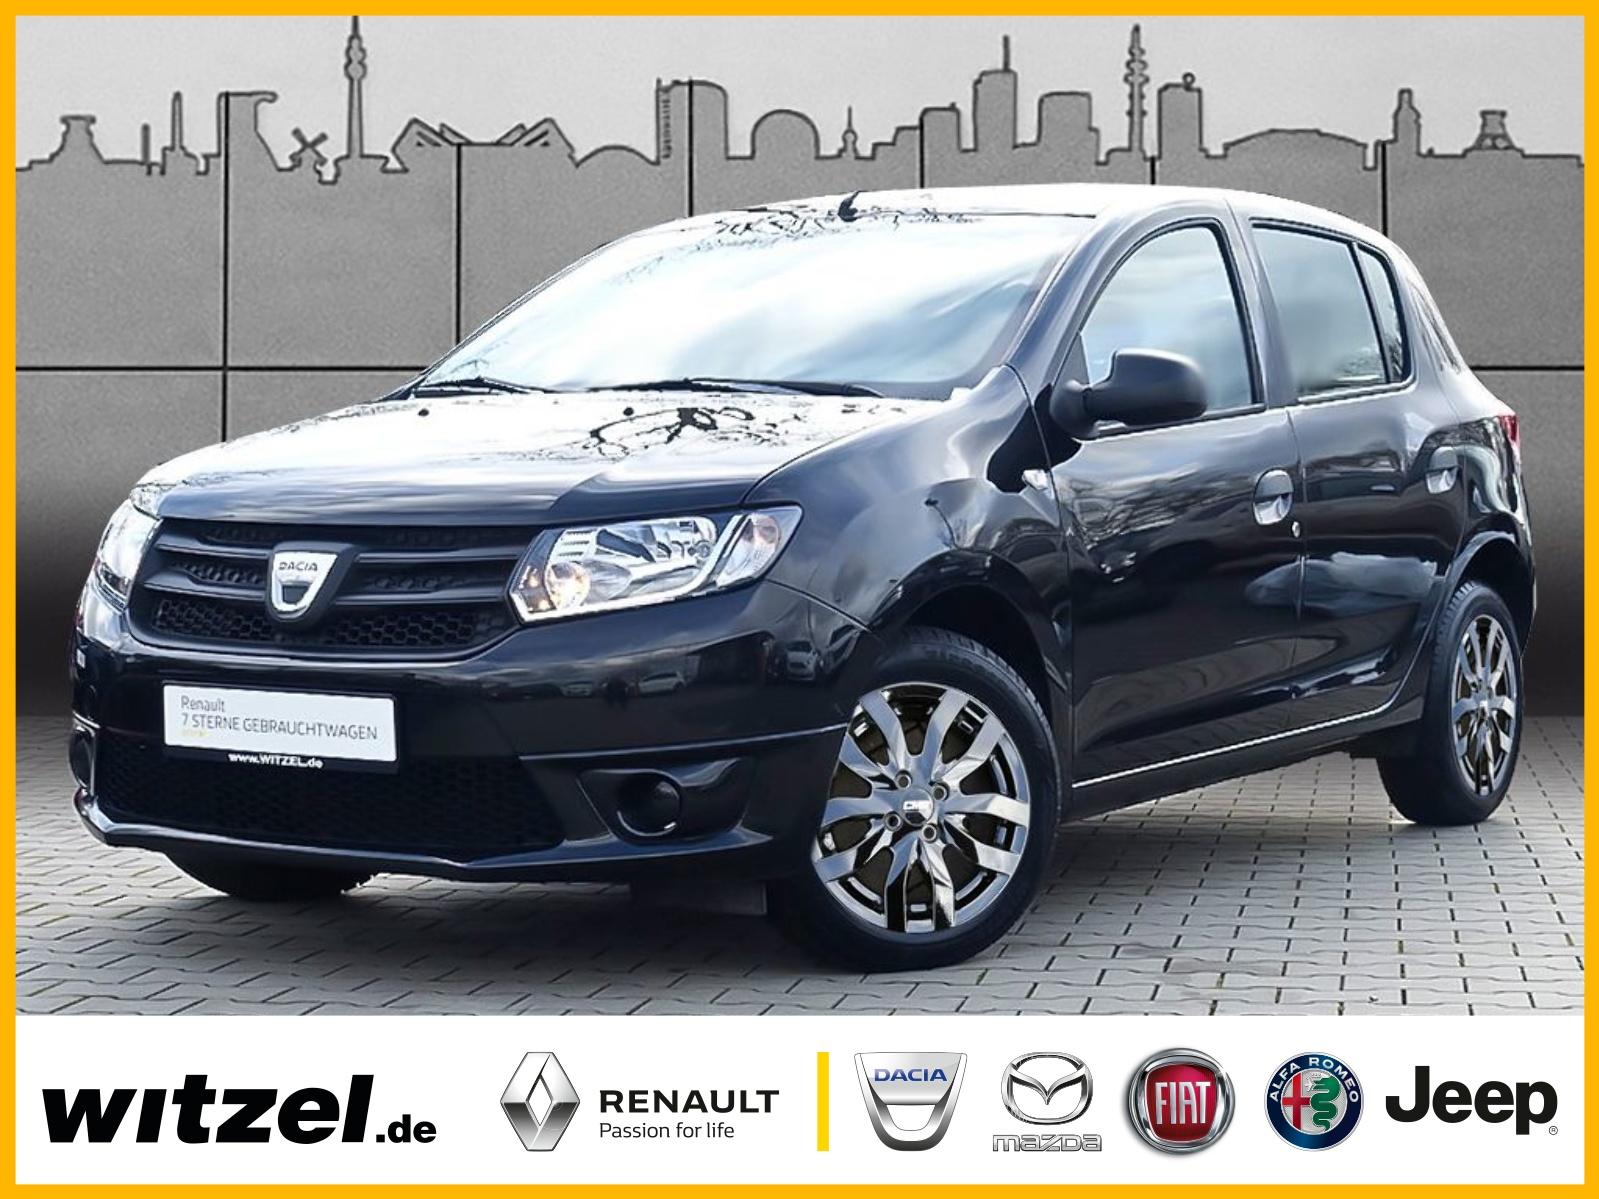 Dacia Sandero 1.2-16V Ambiance KLIMA BT ZV USB eFH LM, Jahr 2015, Benzin